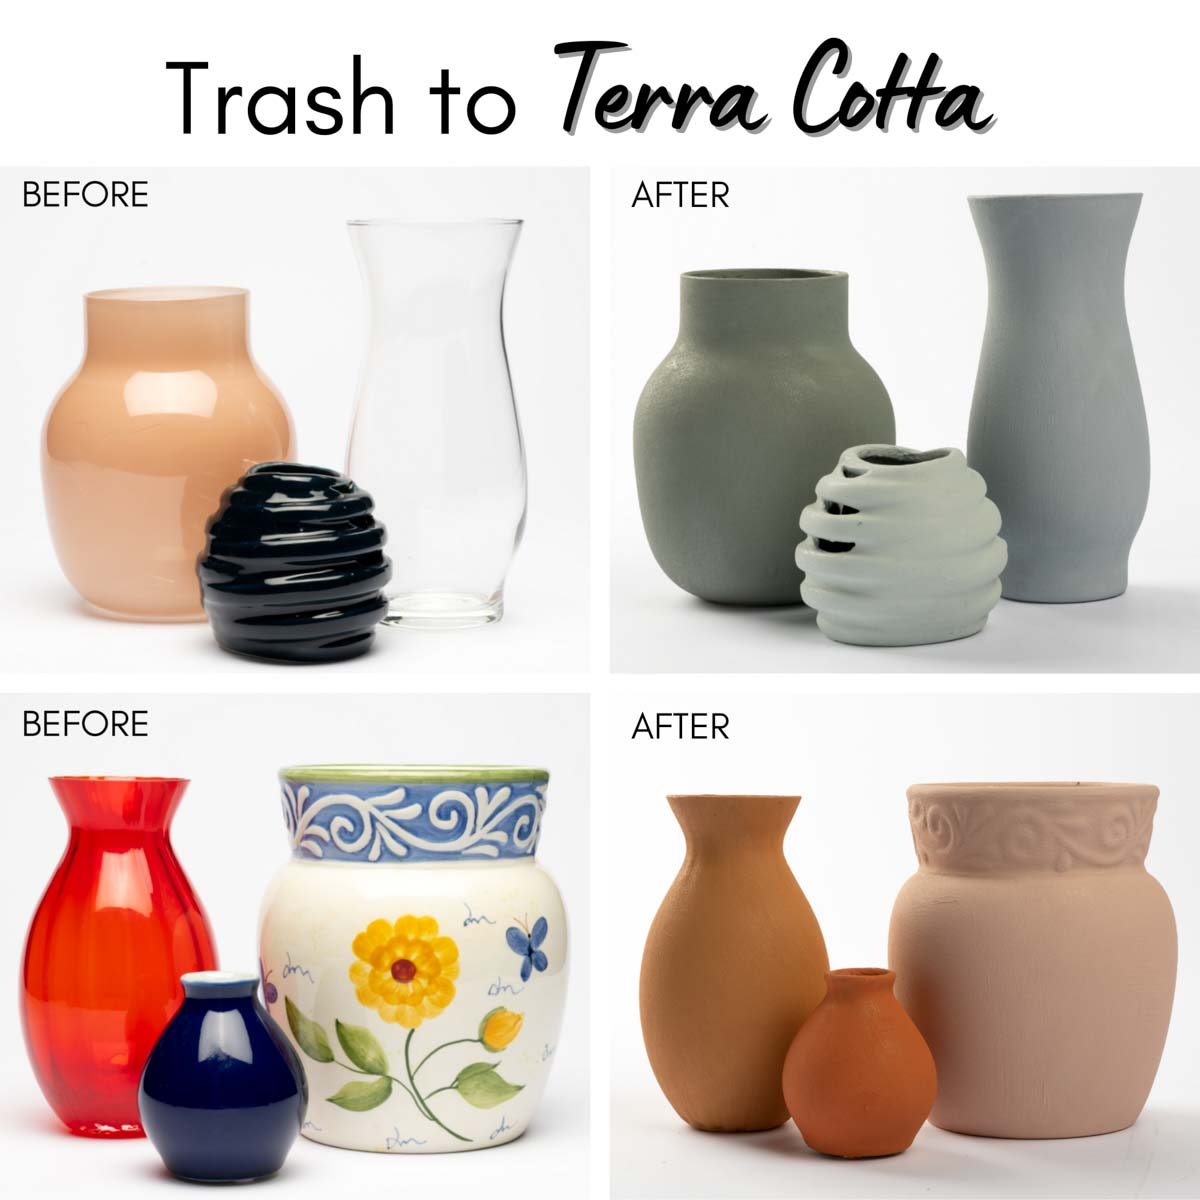 FolkArt ® Terra Cotta™ Acrylic Paint - Terrazzo Sand, 2 oz. - 7014